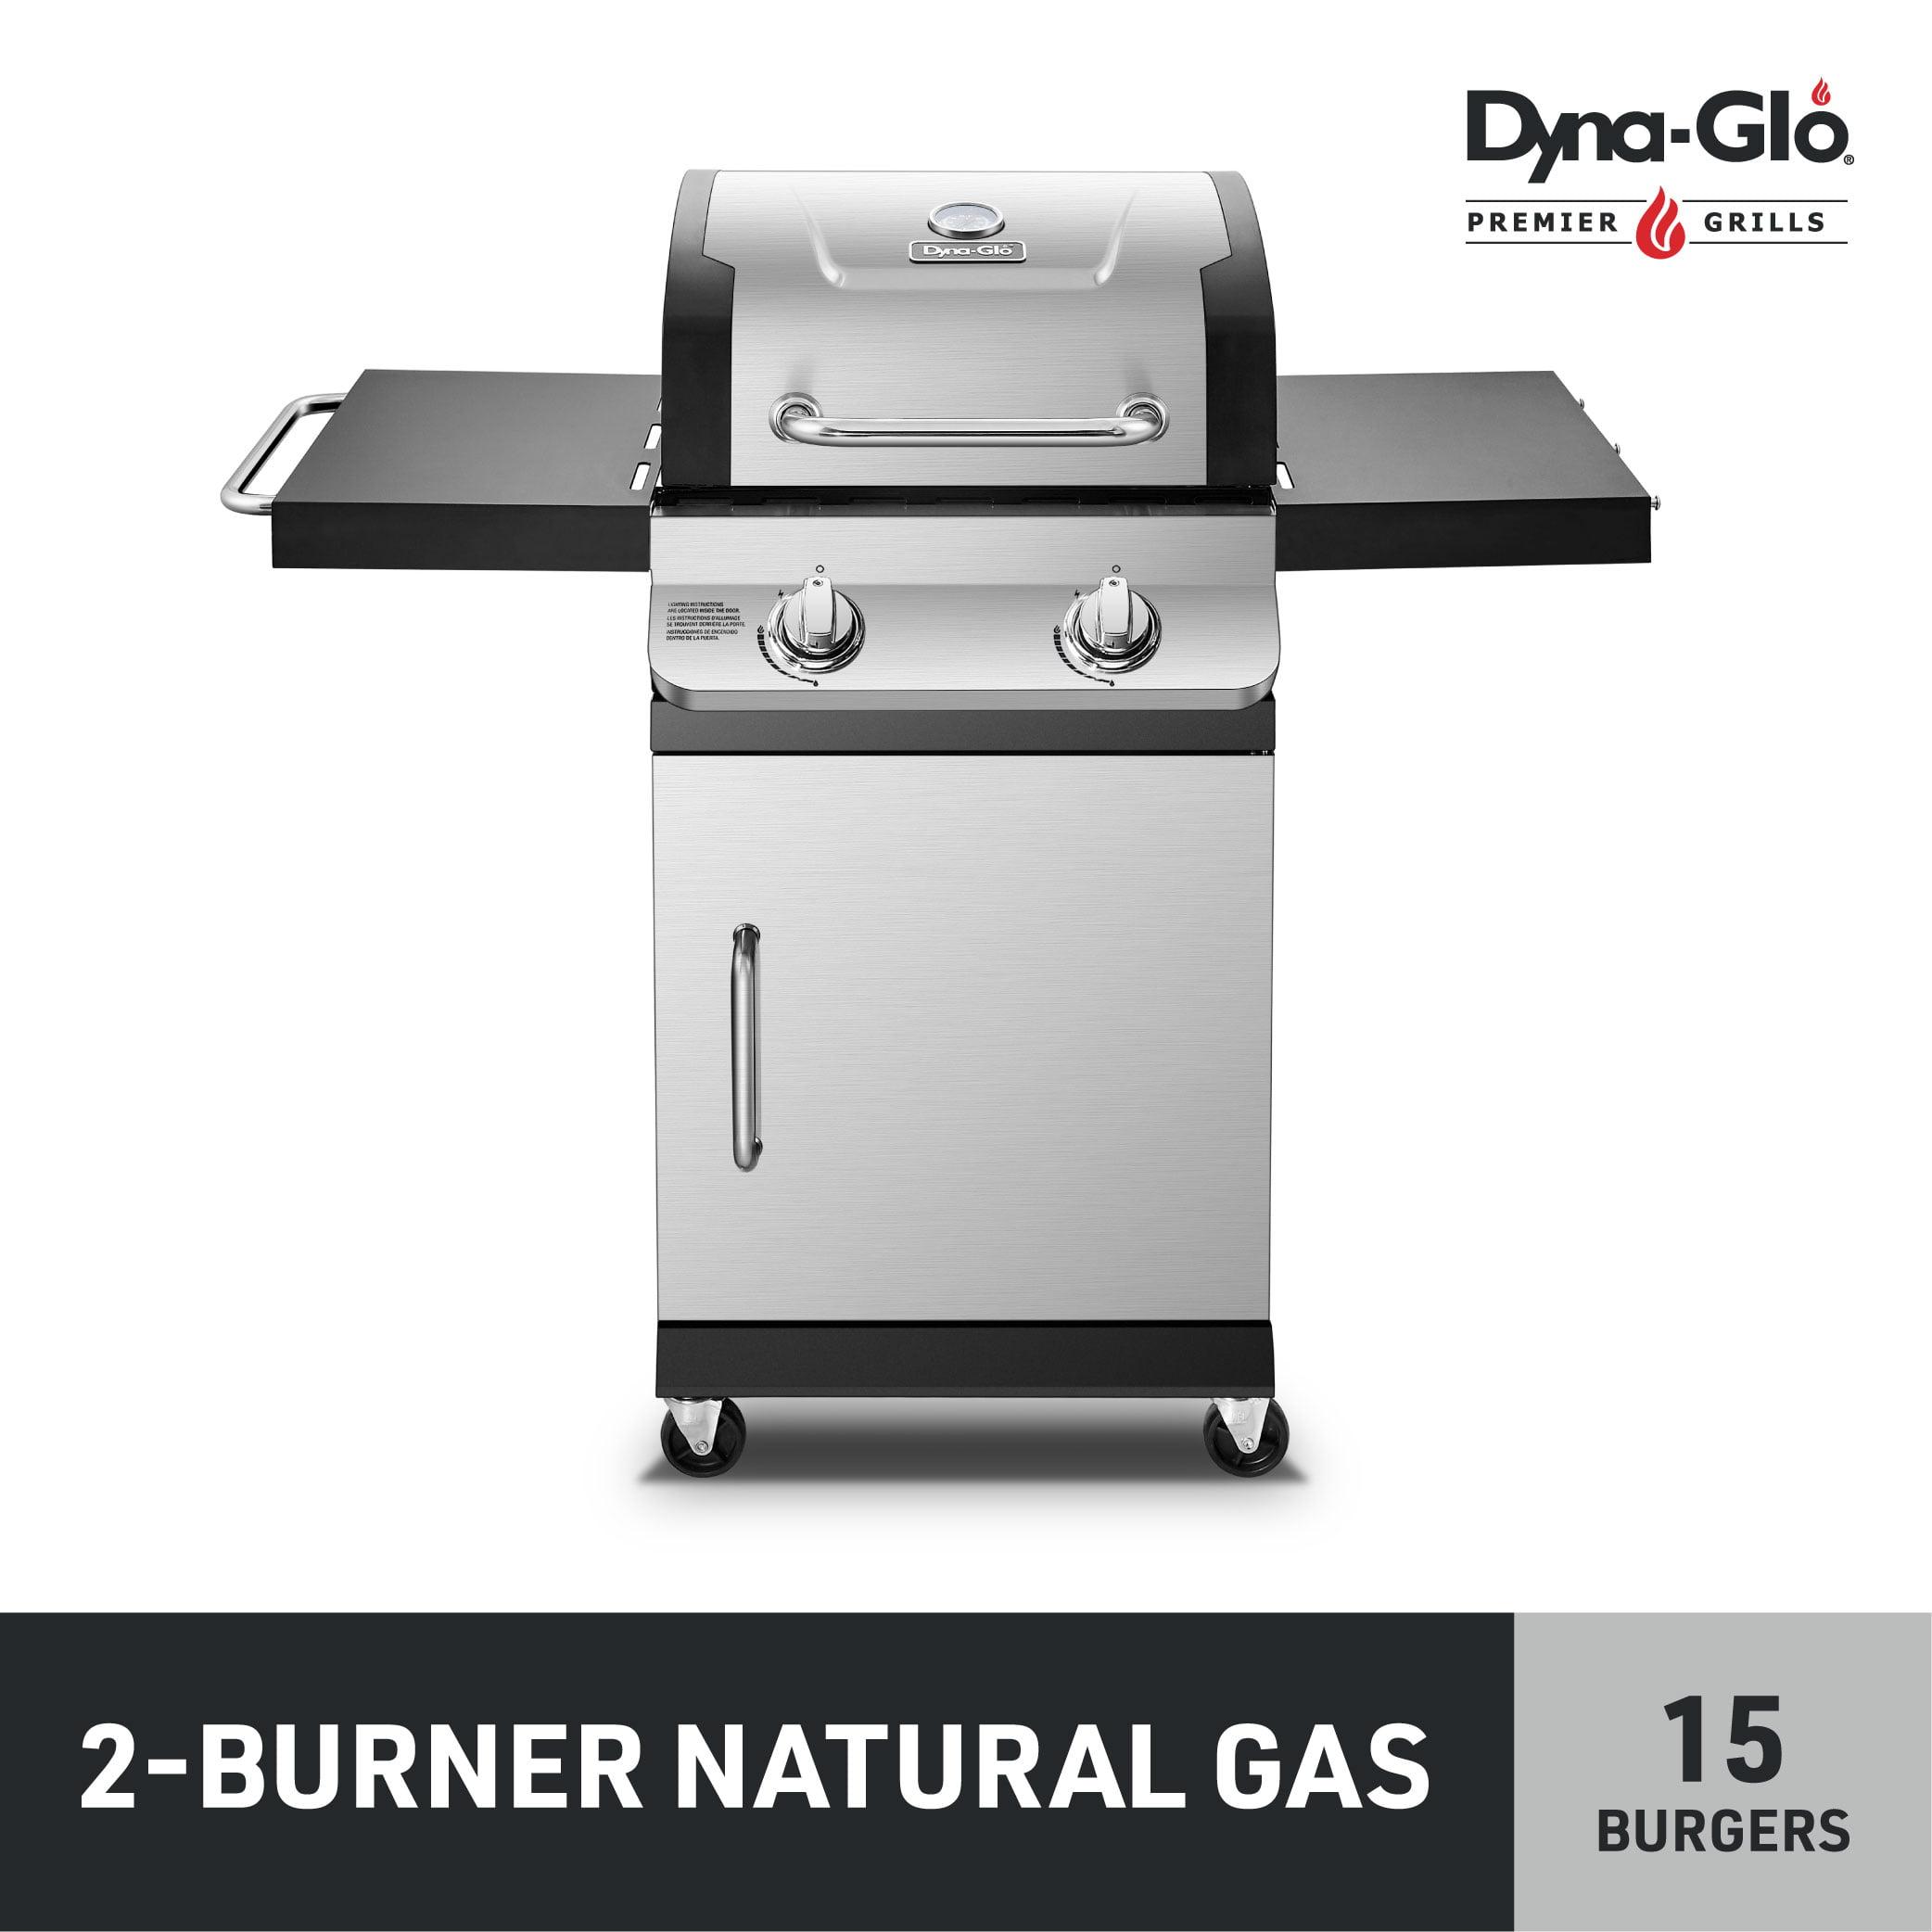 Dyna-Glo Premier 2 Burner Stainless Steel Natural Gas ...